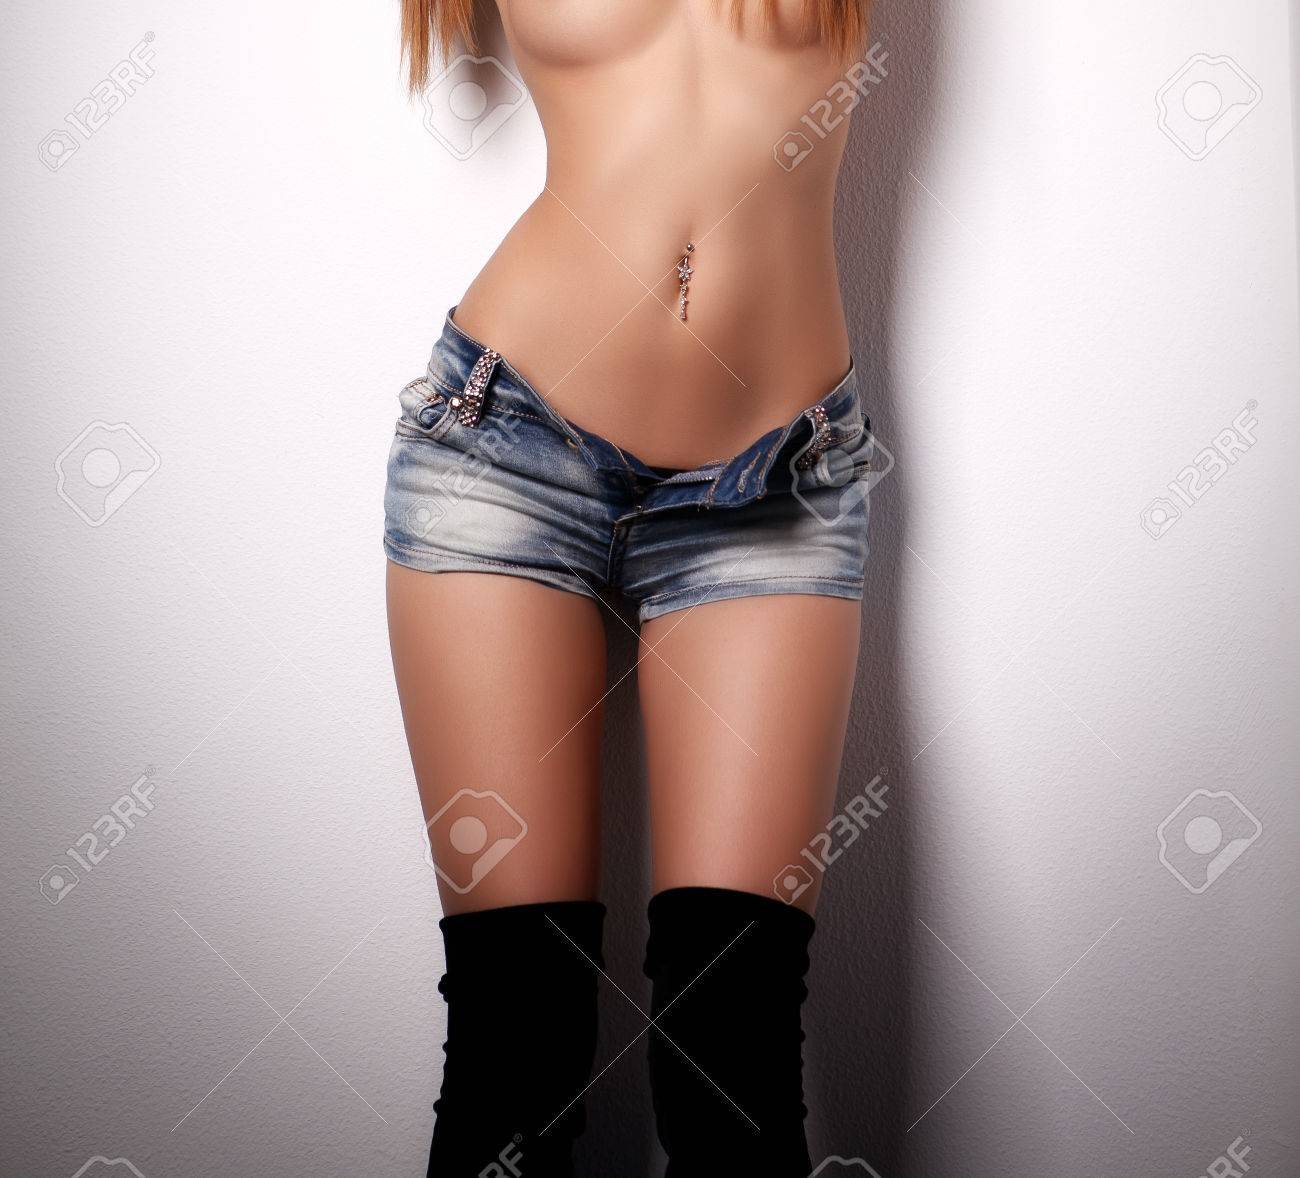 Nude public fucking drunk